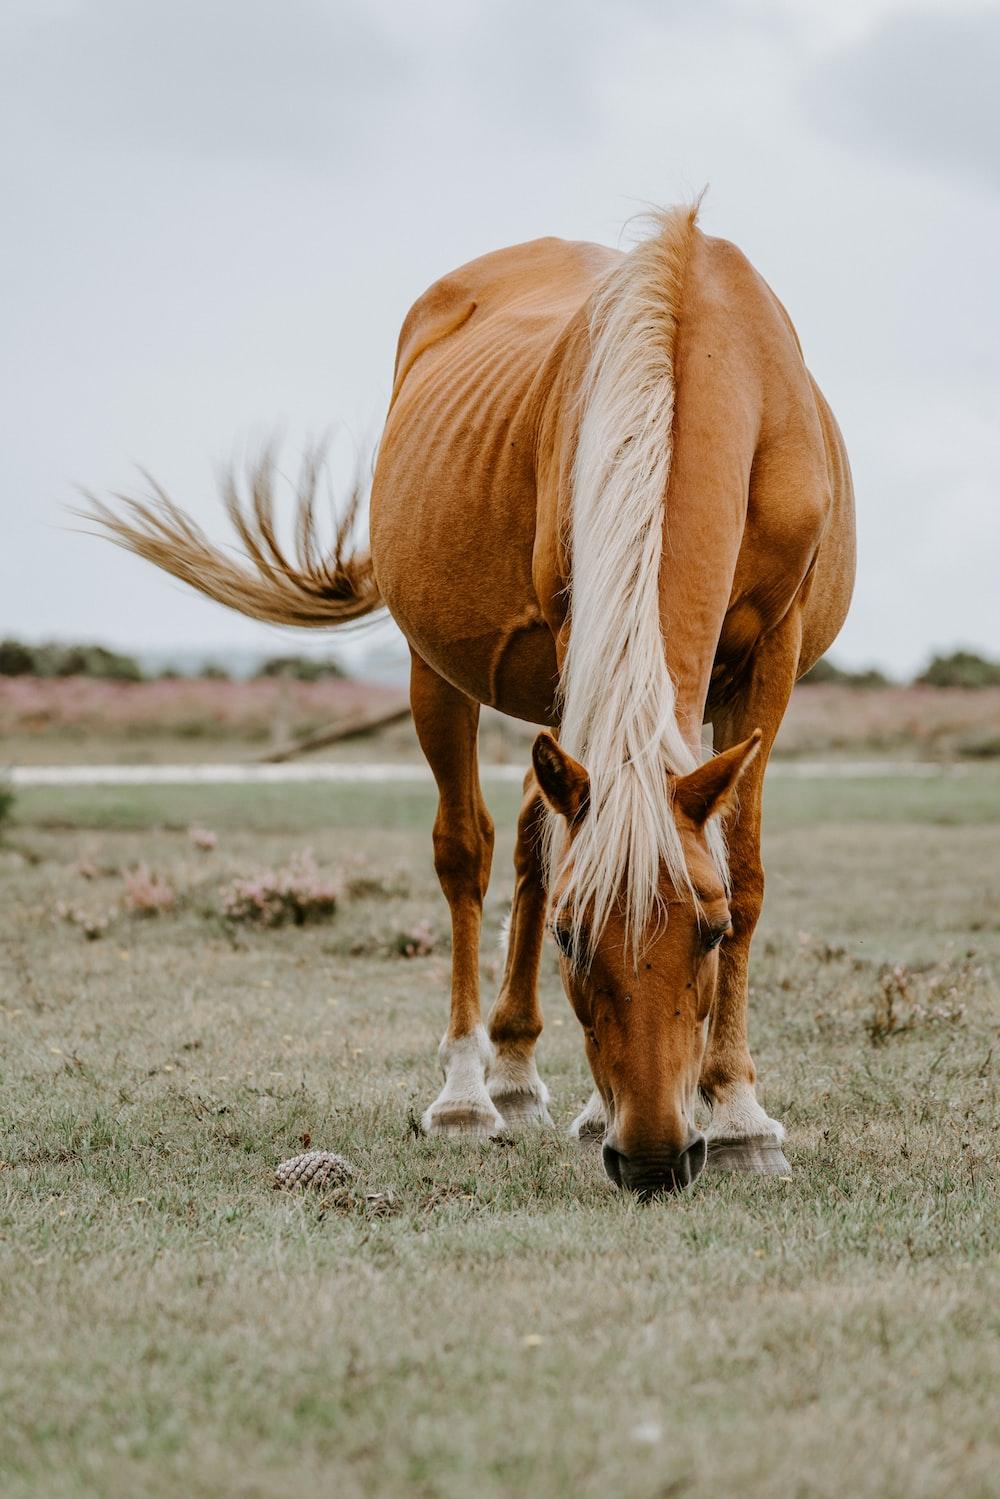 orange and white horse on grass